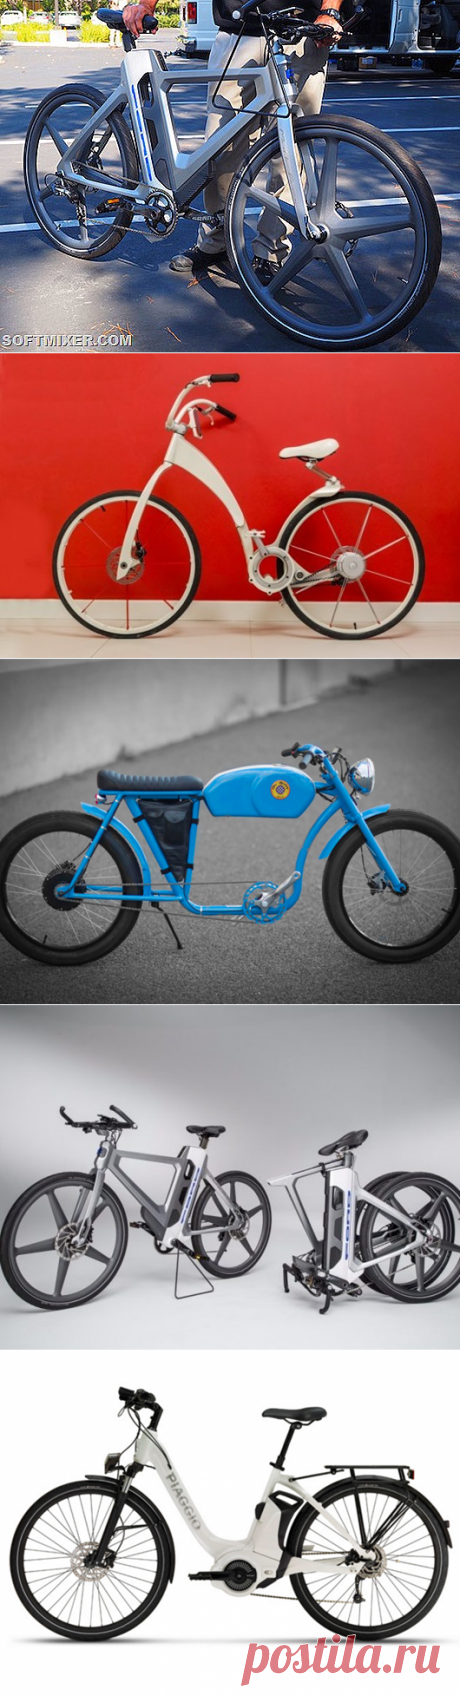 Las bicicletas del futuro próximo | SOFTMIXER